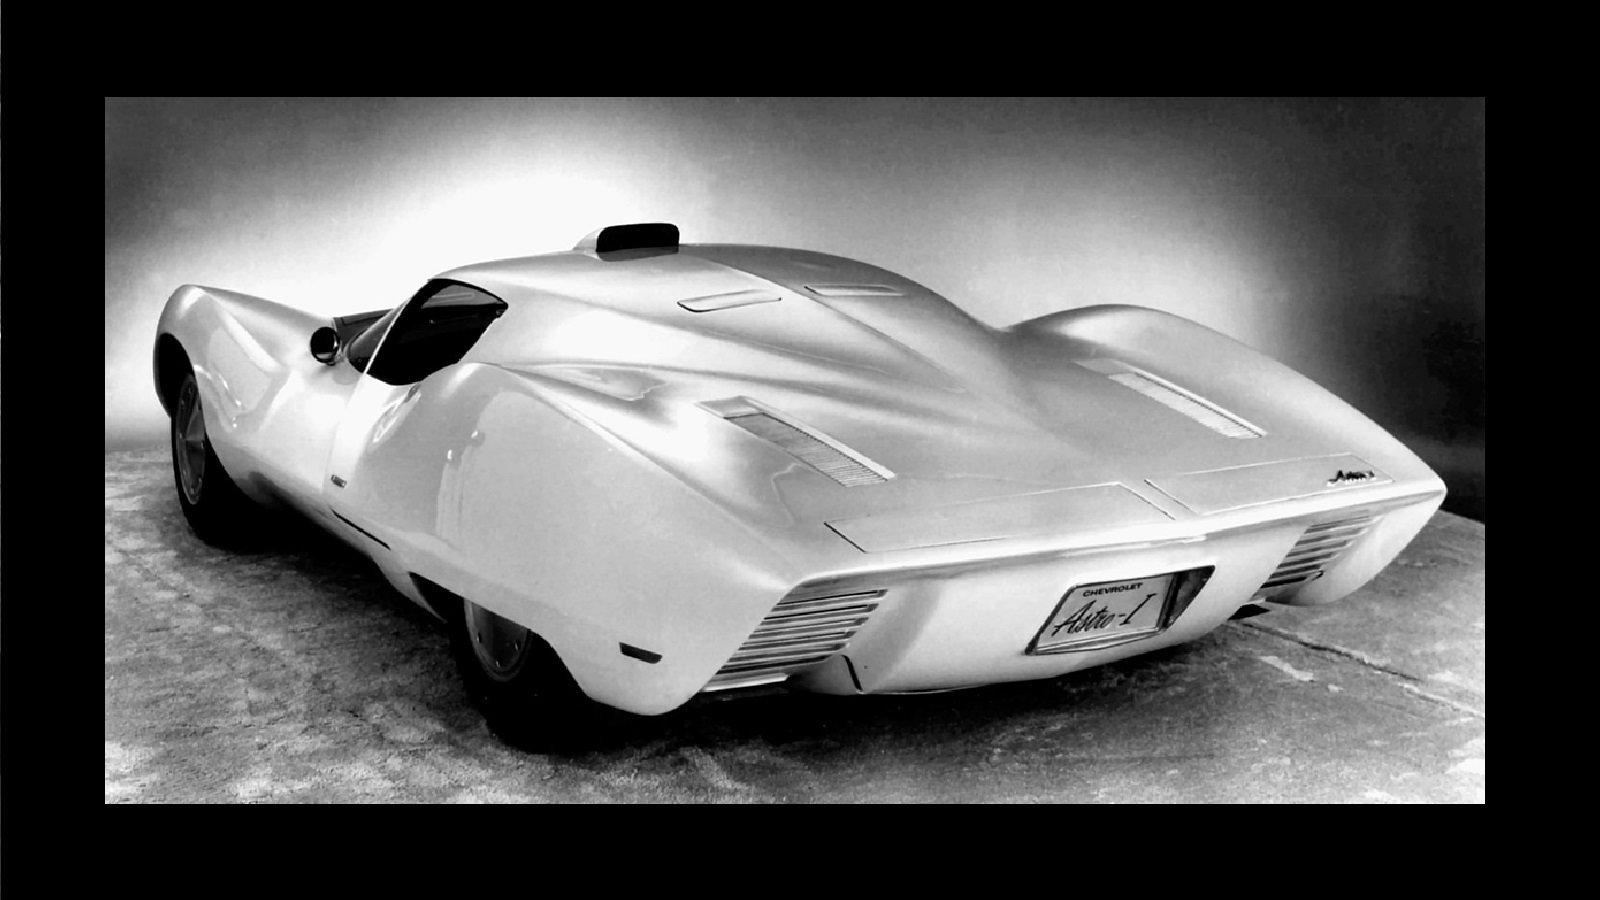 1967 Astro I